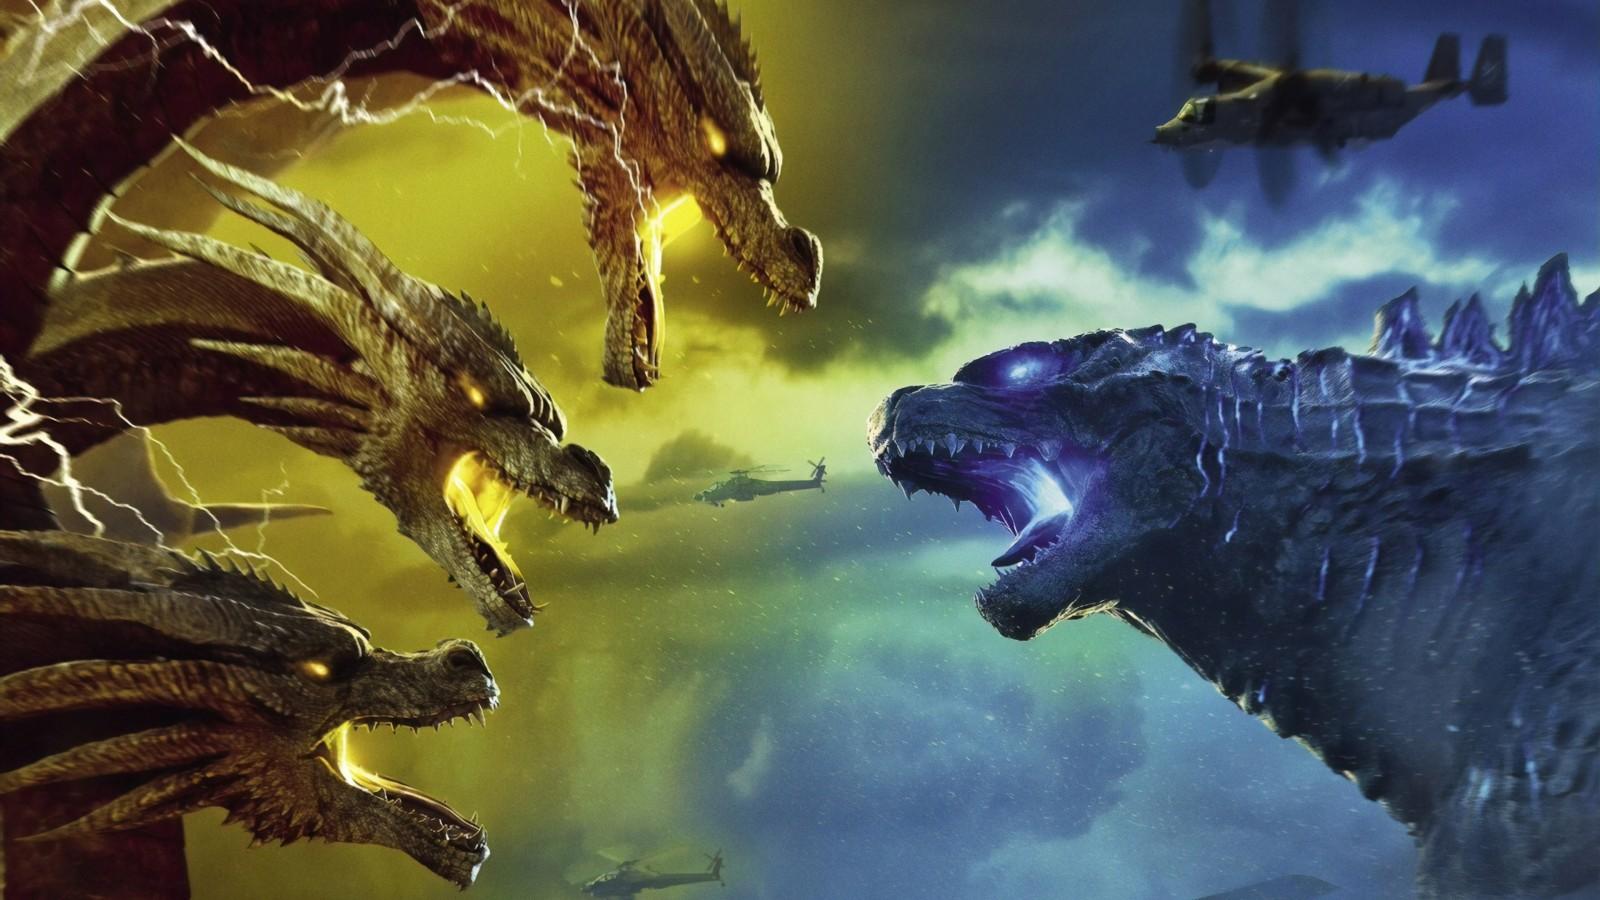 Windows 8 Wallpaper Hd 1080p 3d Godzilla King Of The Monsters Final Battle 4k Wallpapers